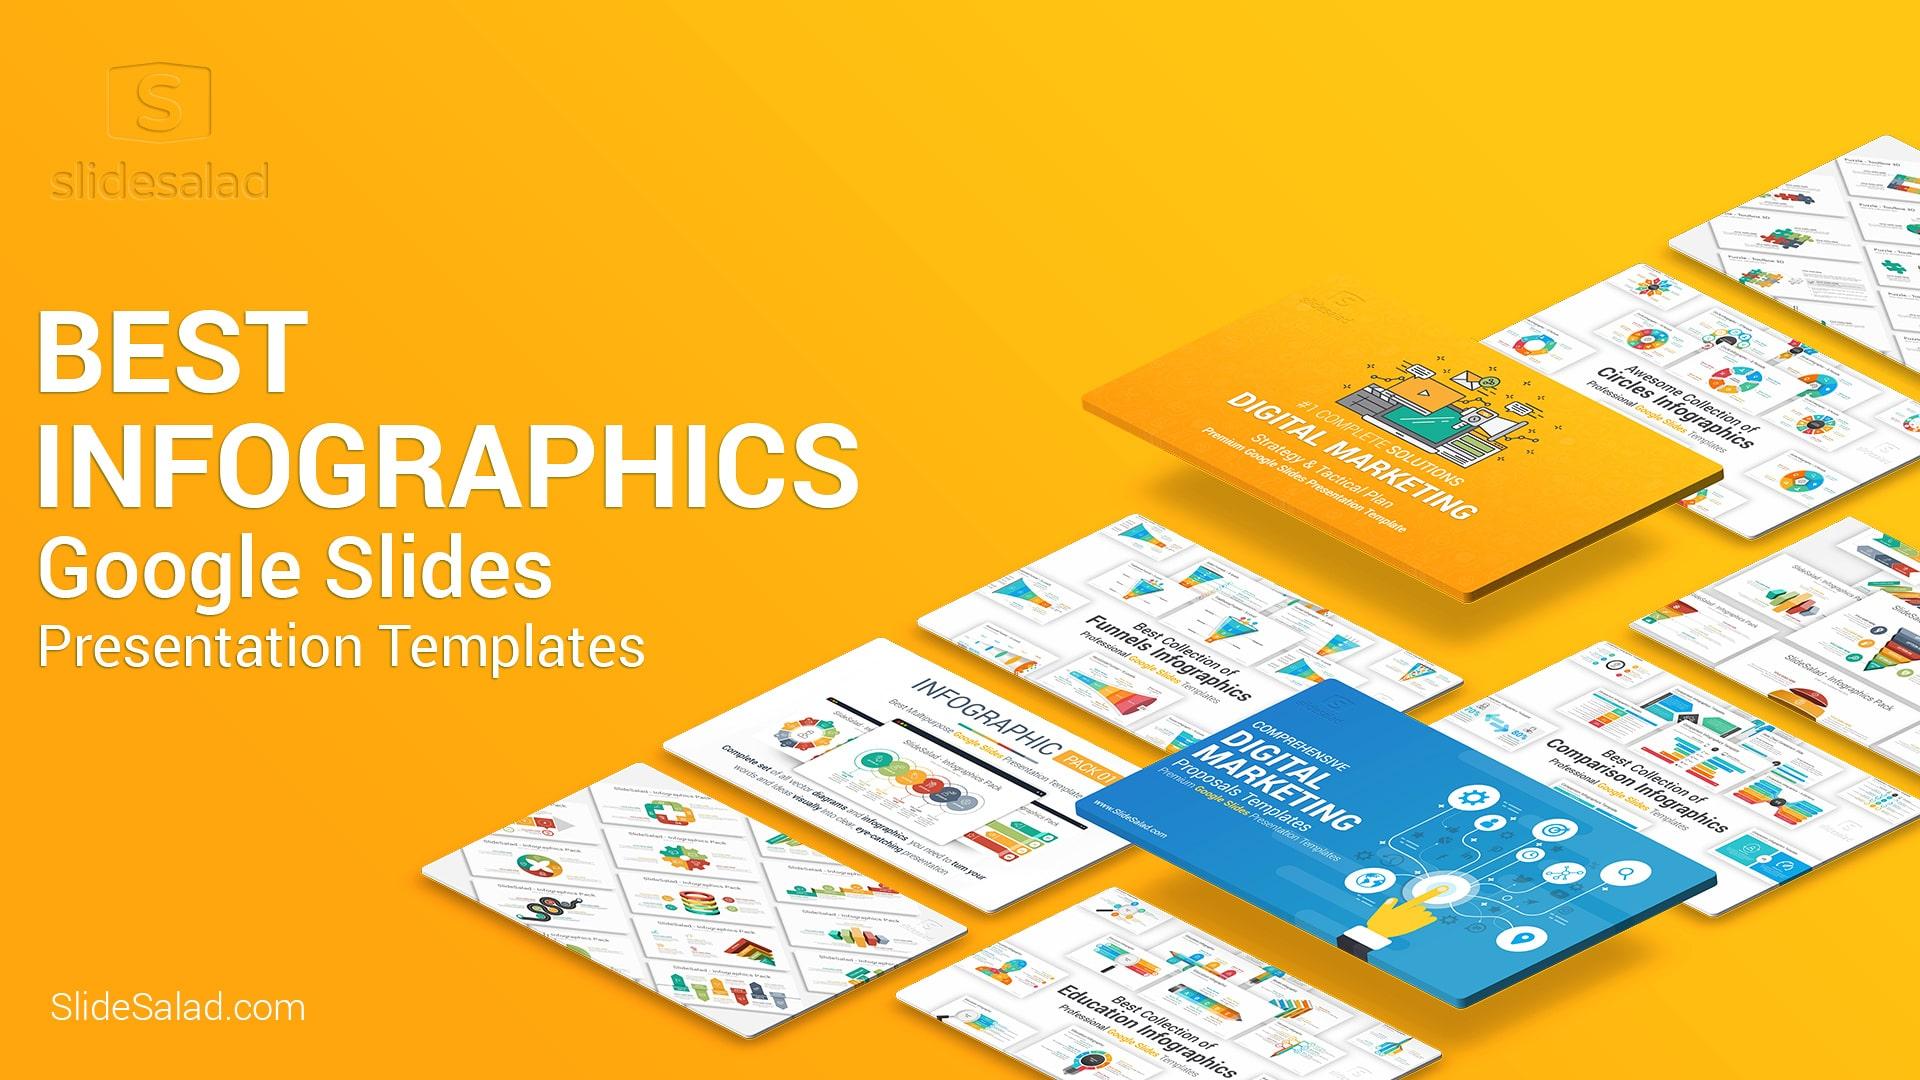 Best Infographics Google Slides Templates